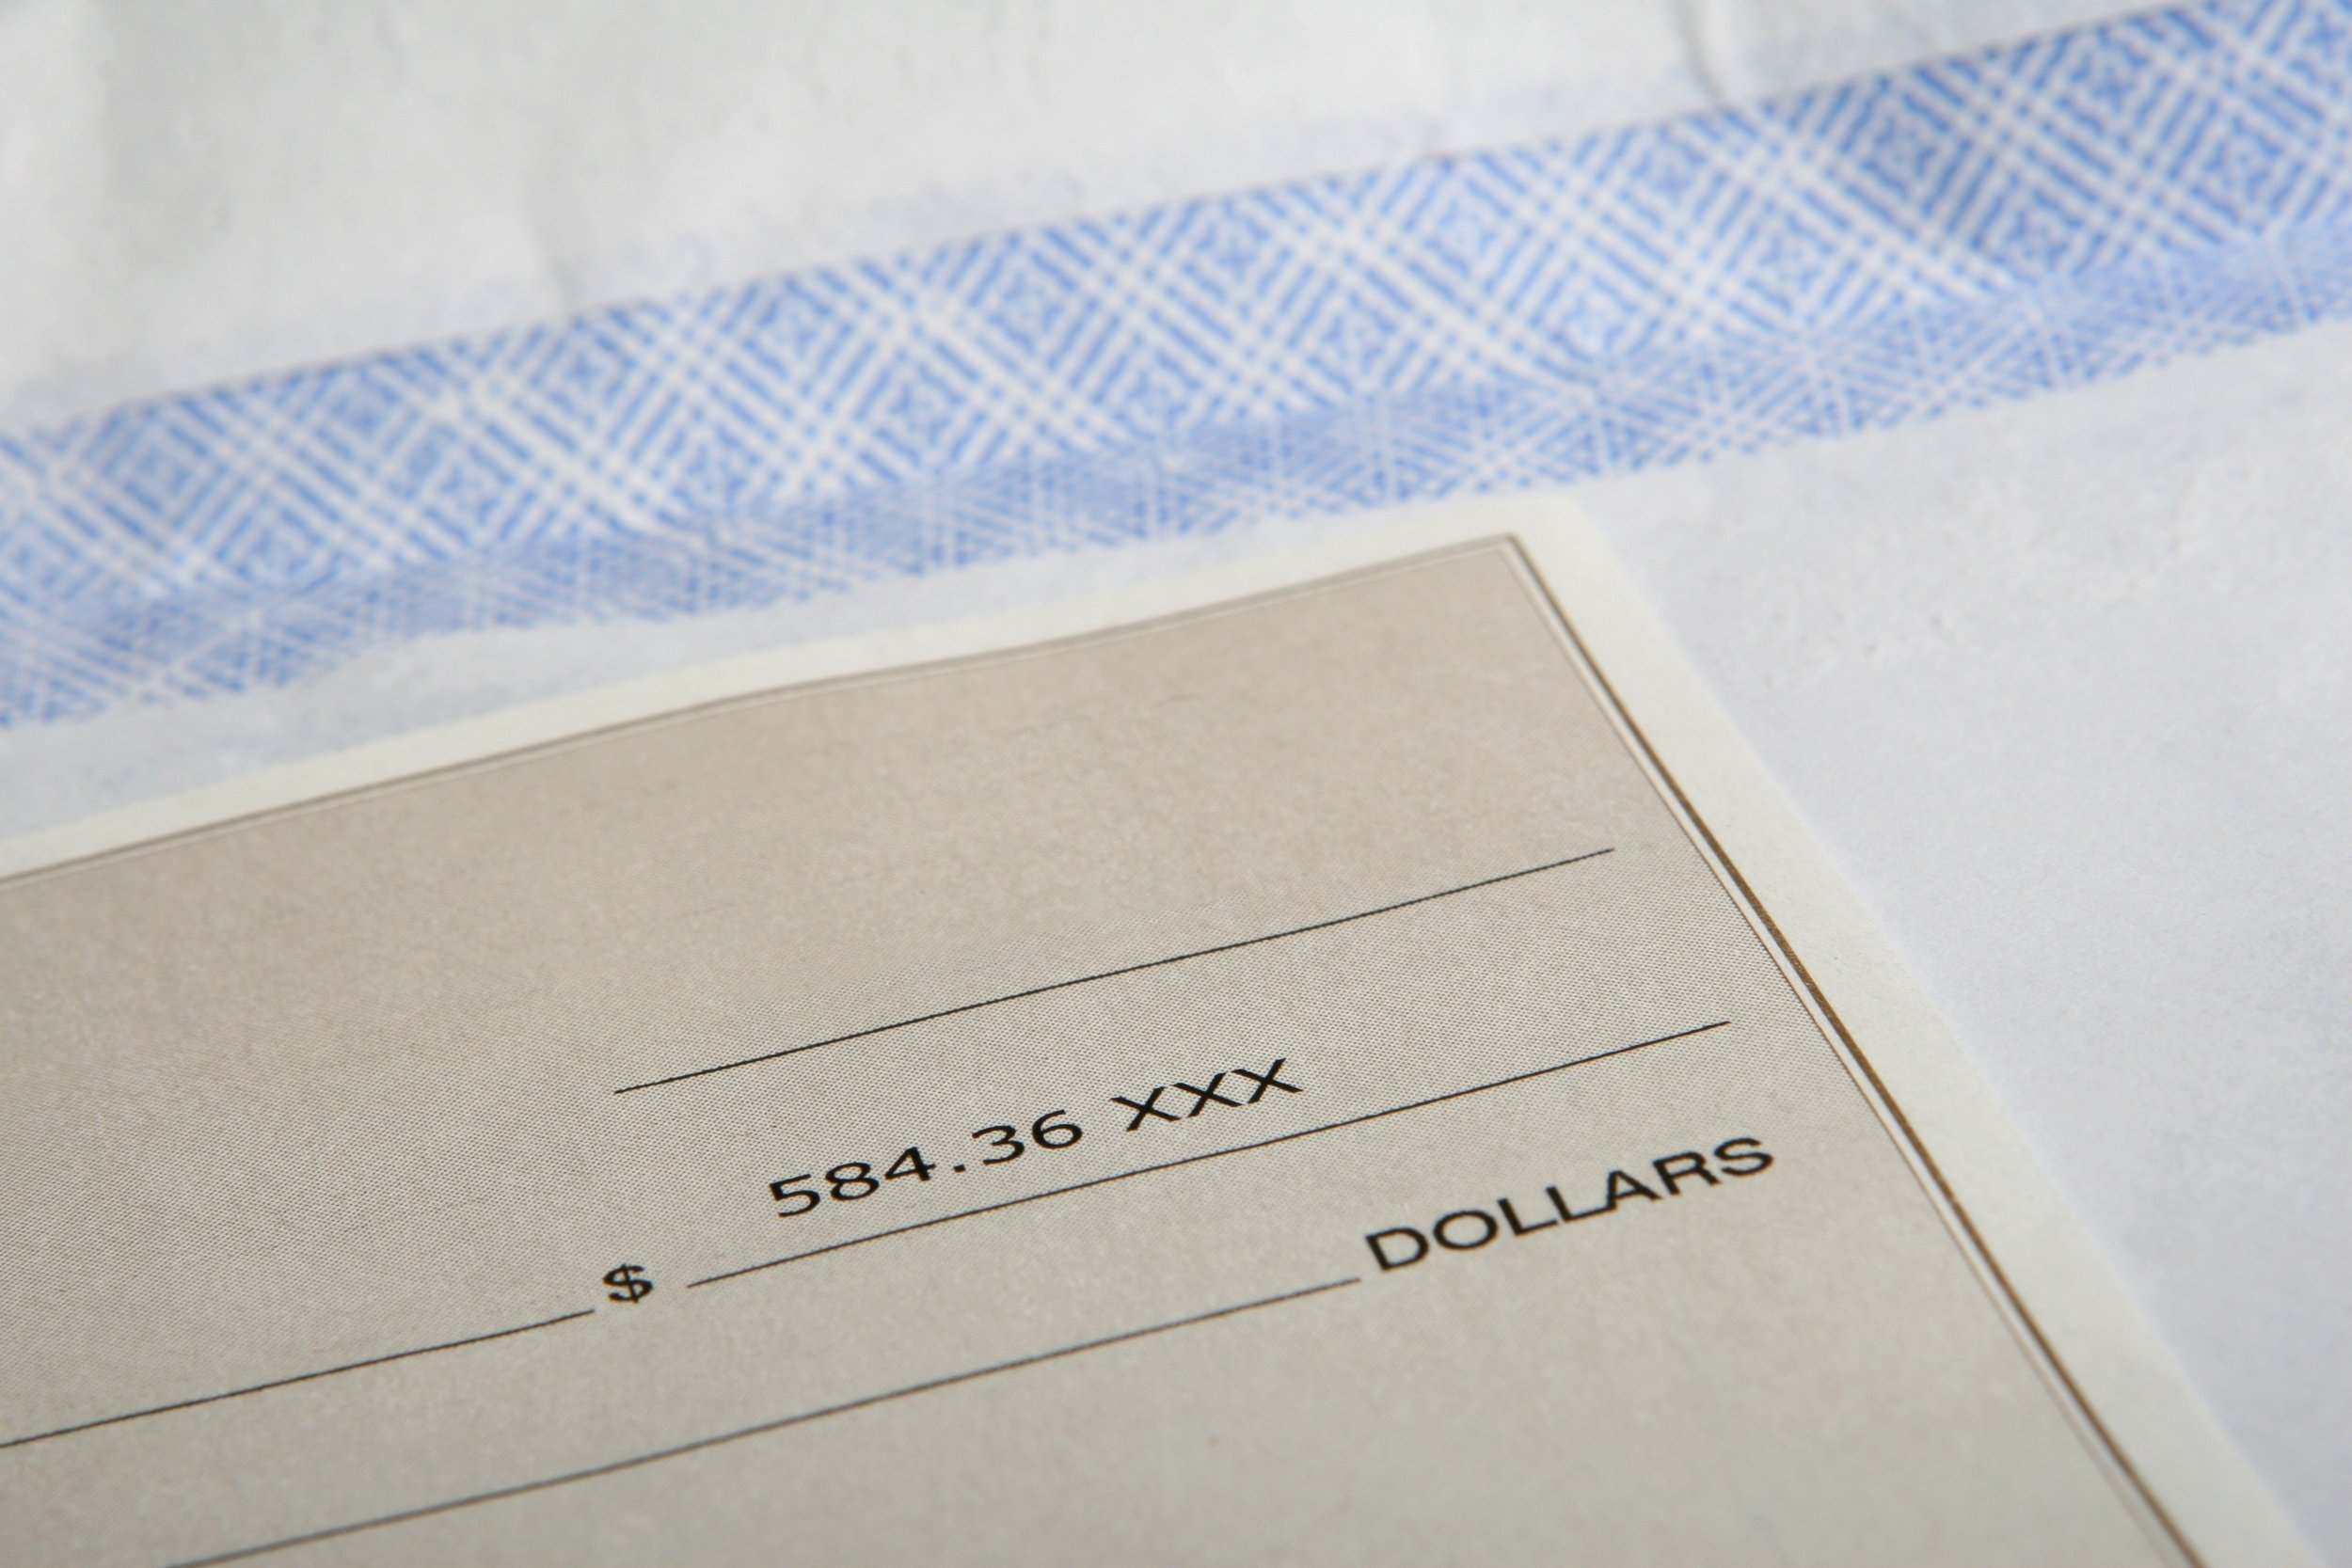 american-bills-business-259130.jpg